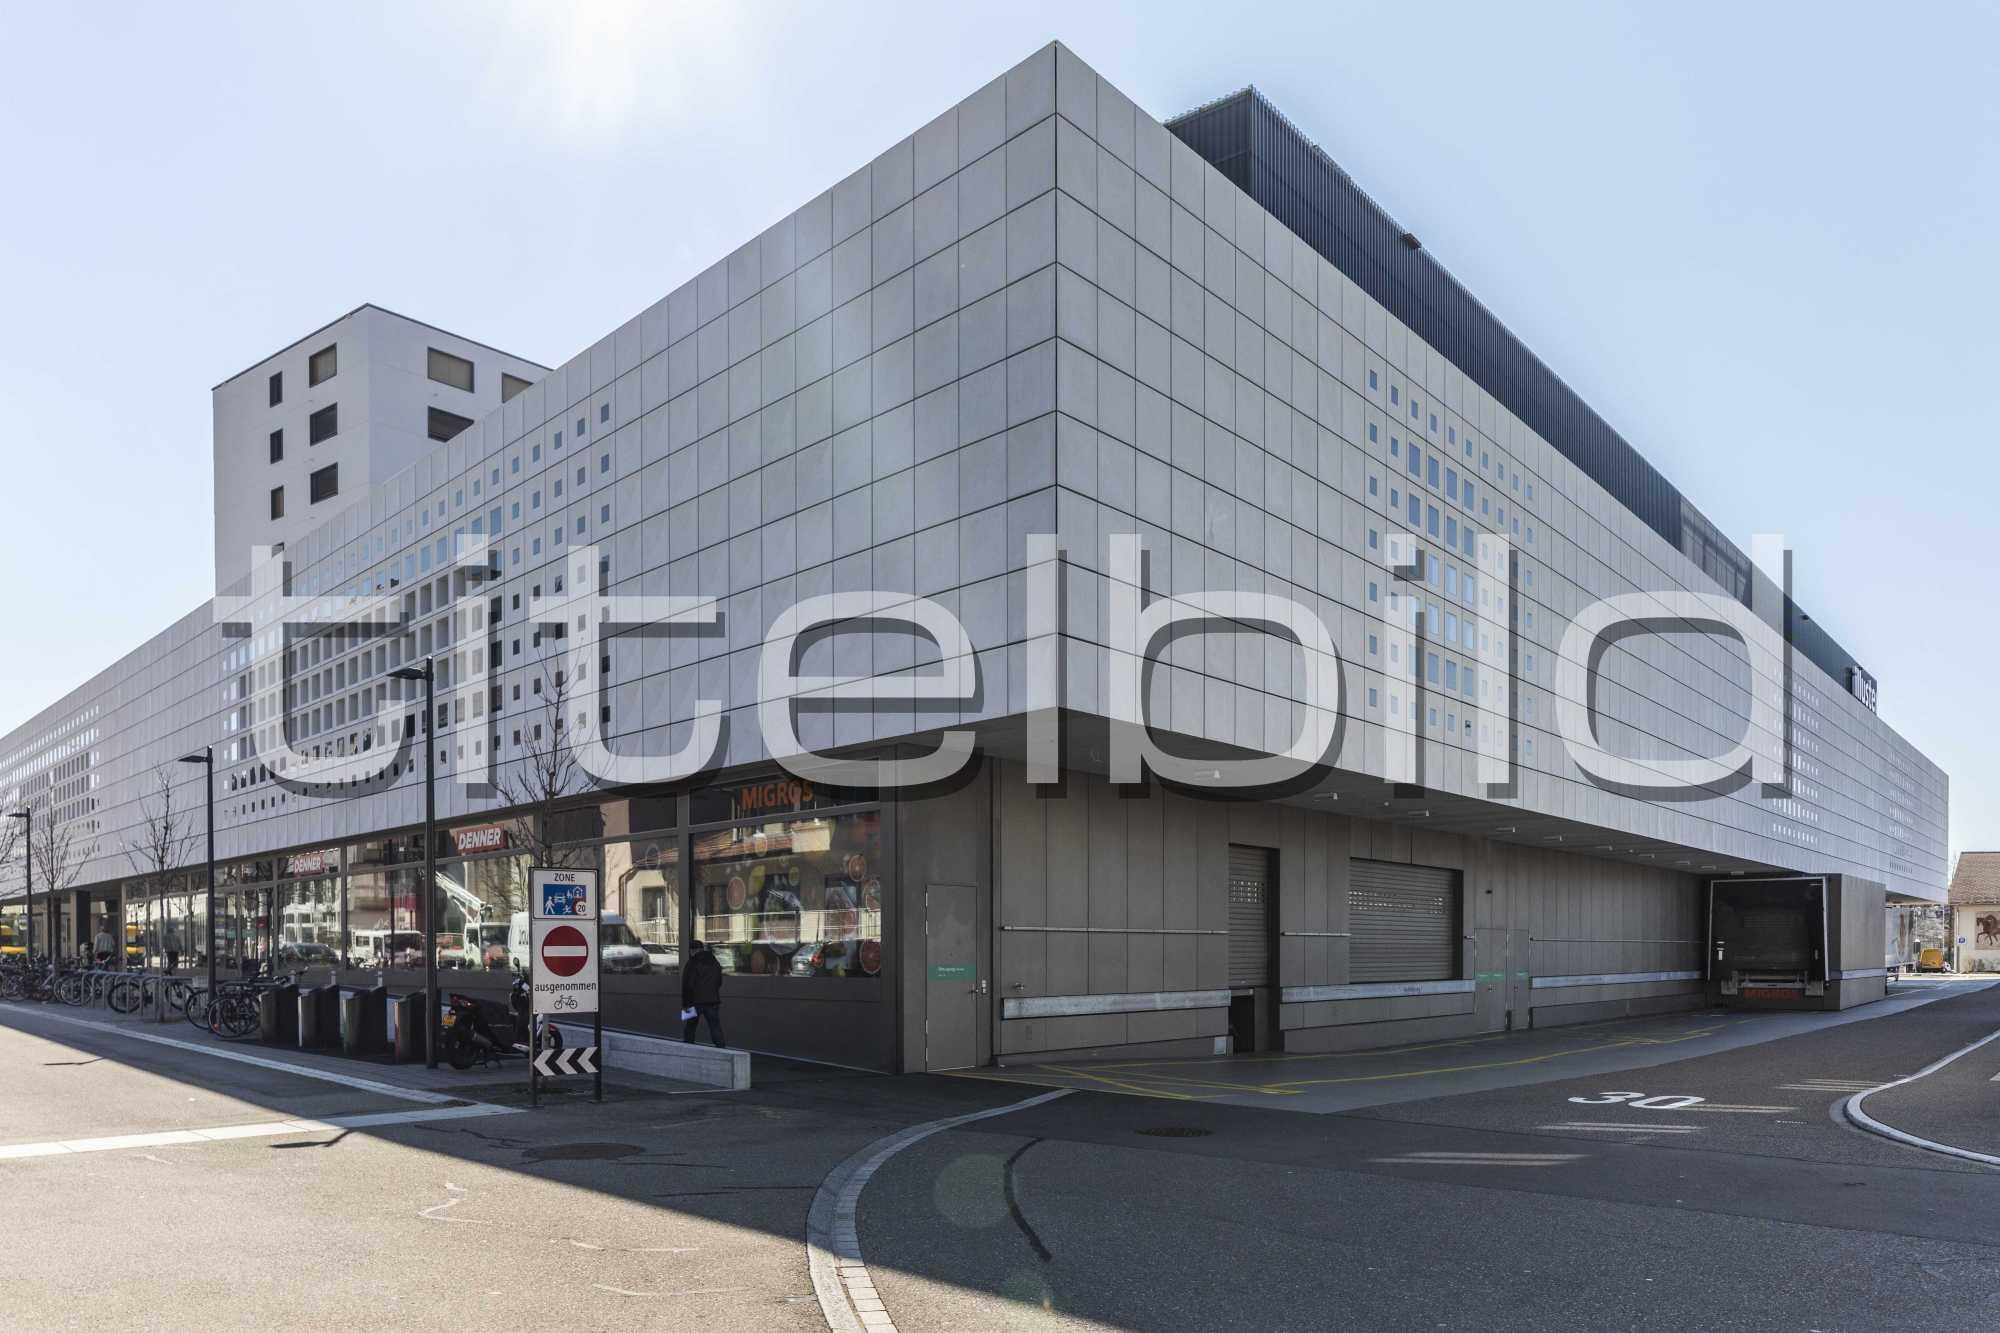 Projektbild-Nr. 5: Illuster Umbau Einkaufszentrum